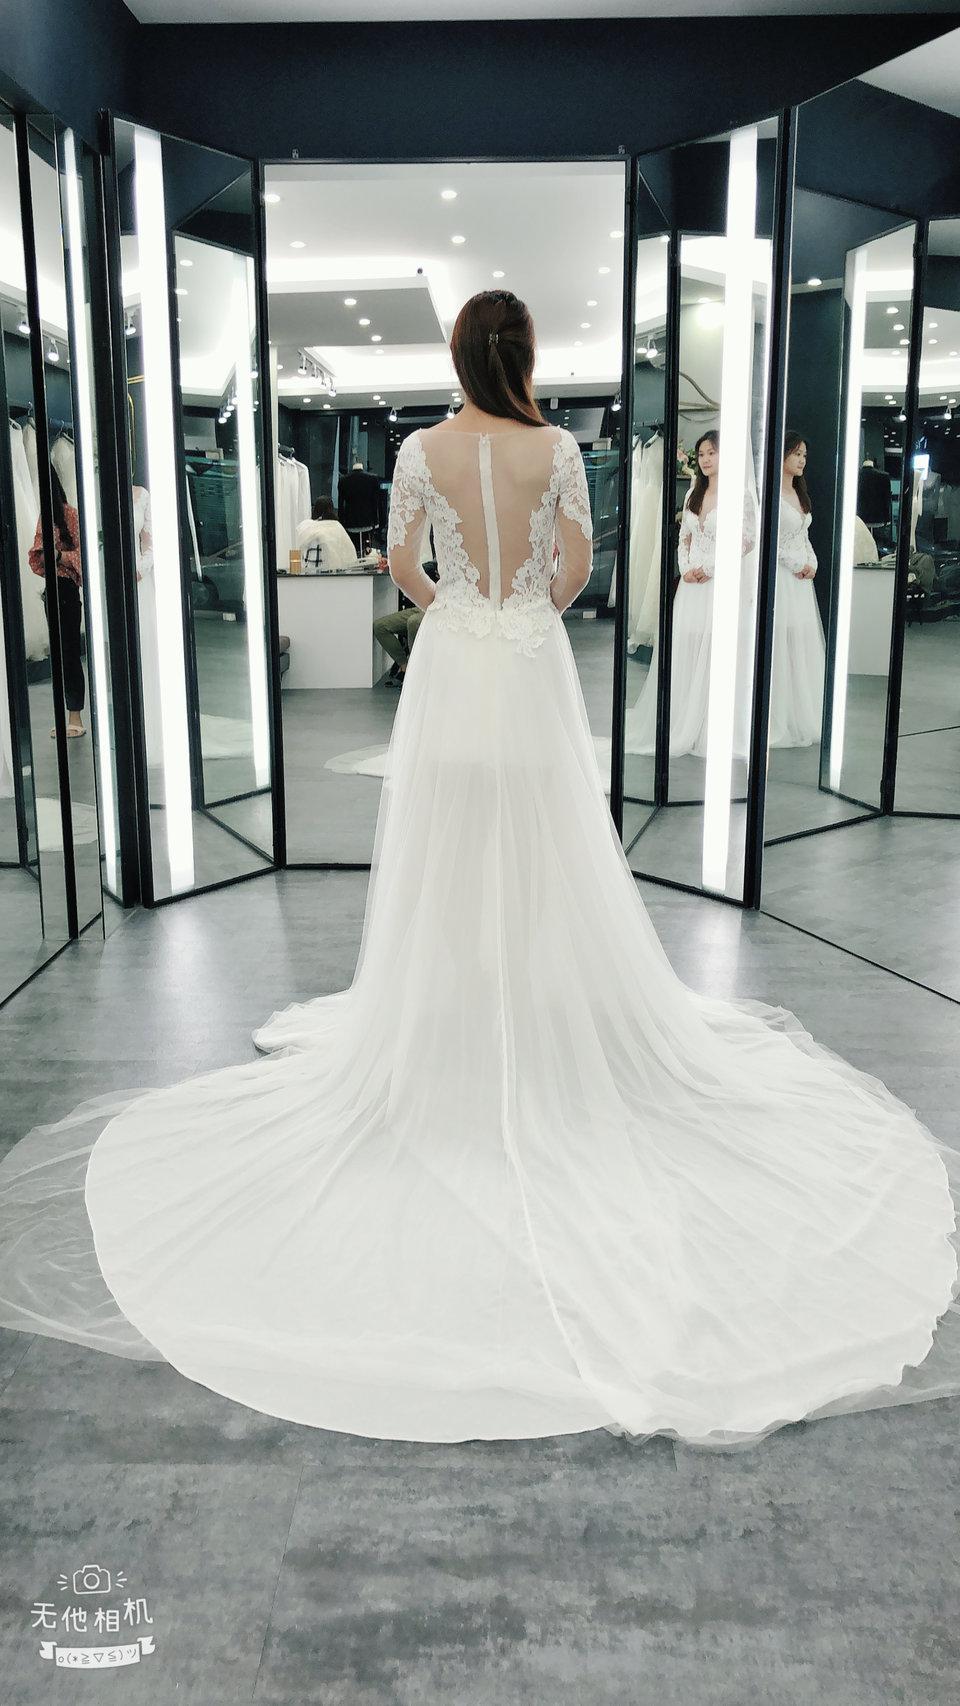 J2 wedding 中壢 手工訂製婚紗,J2 Wedding 中壢店!CP值超高的婚紗攝影!